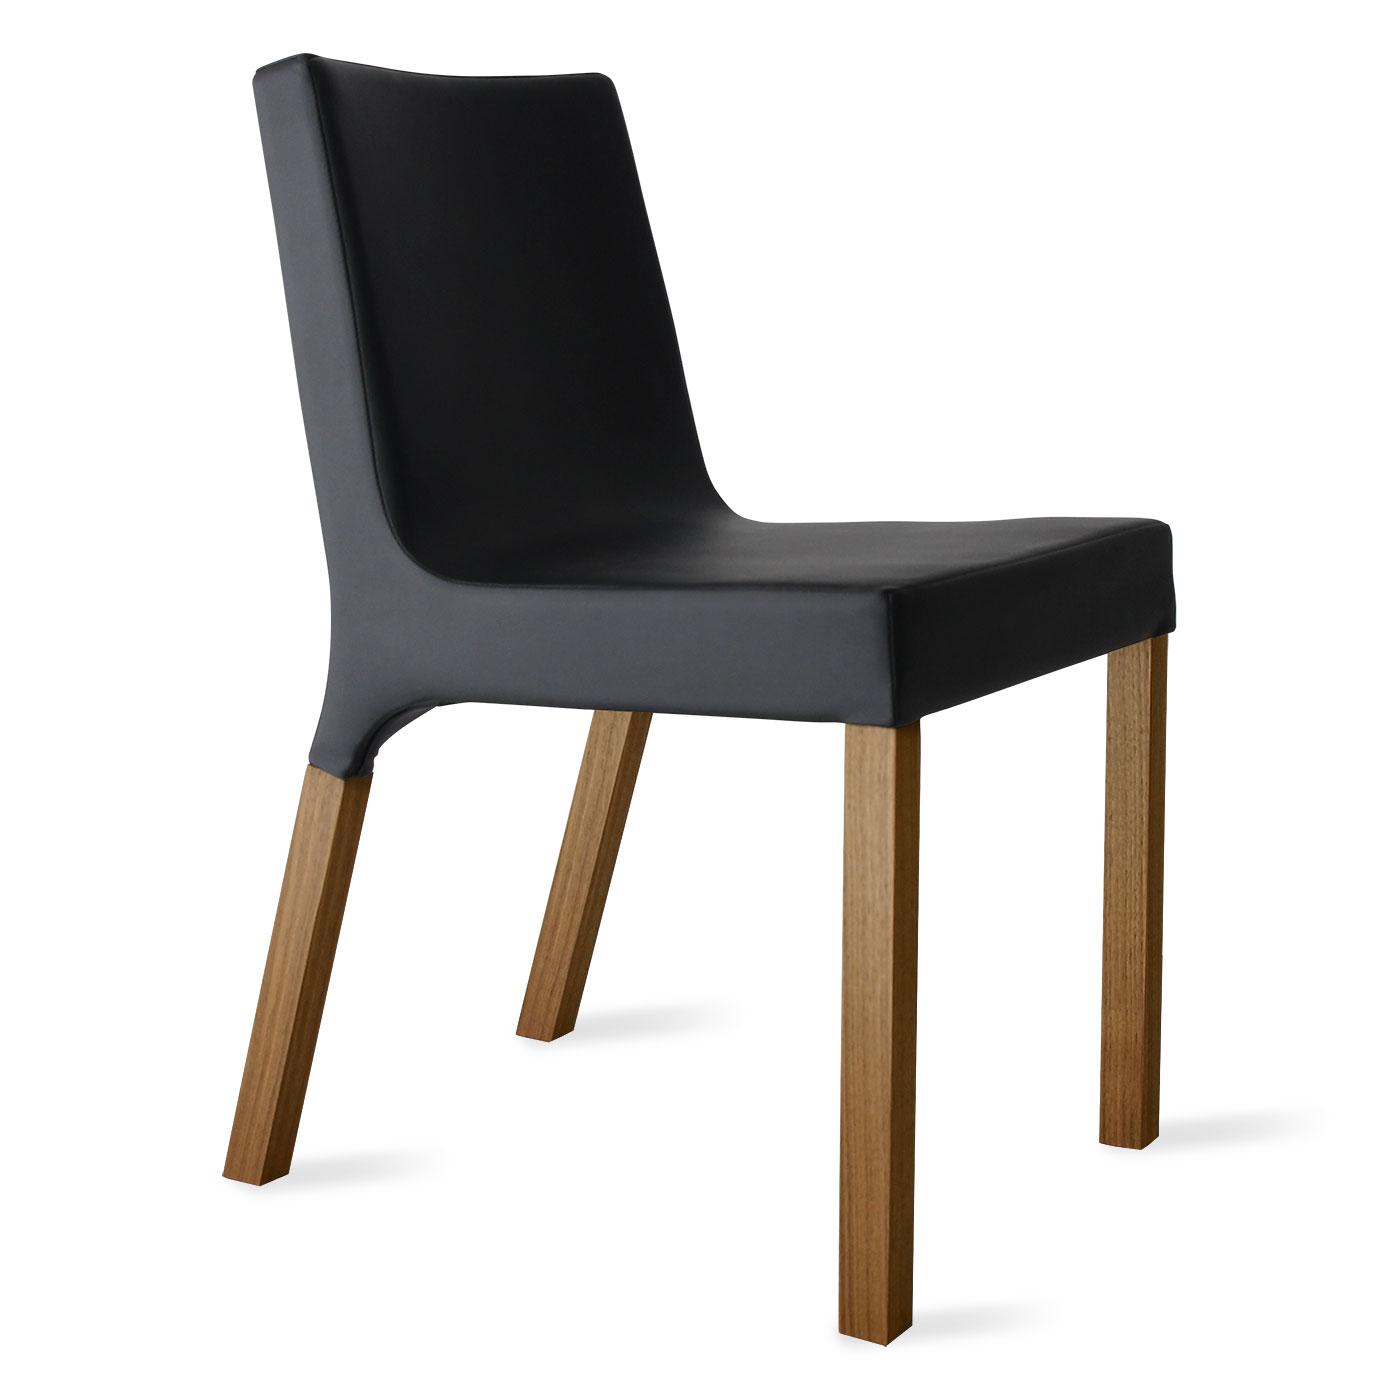 modern chairs knicker chair GQNMEUZ